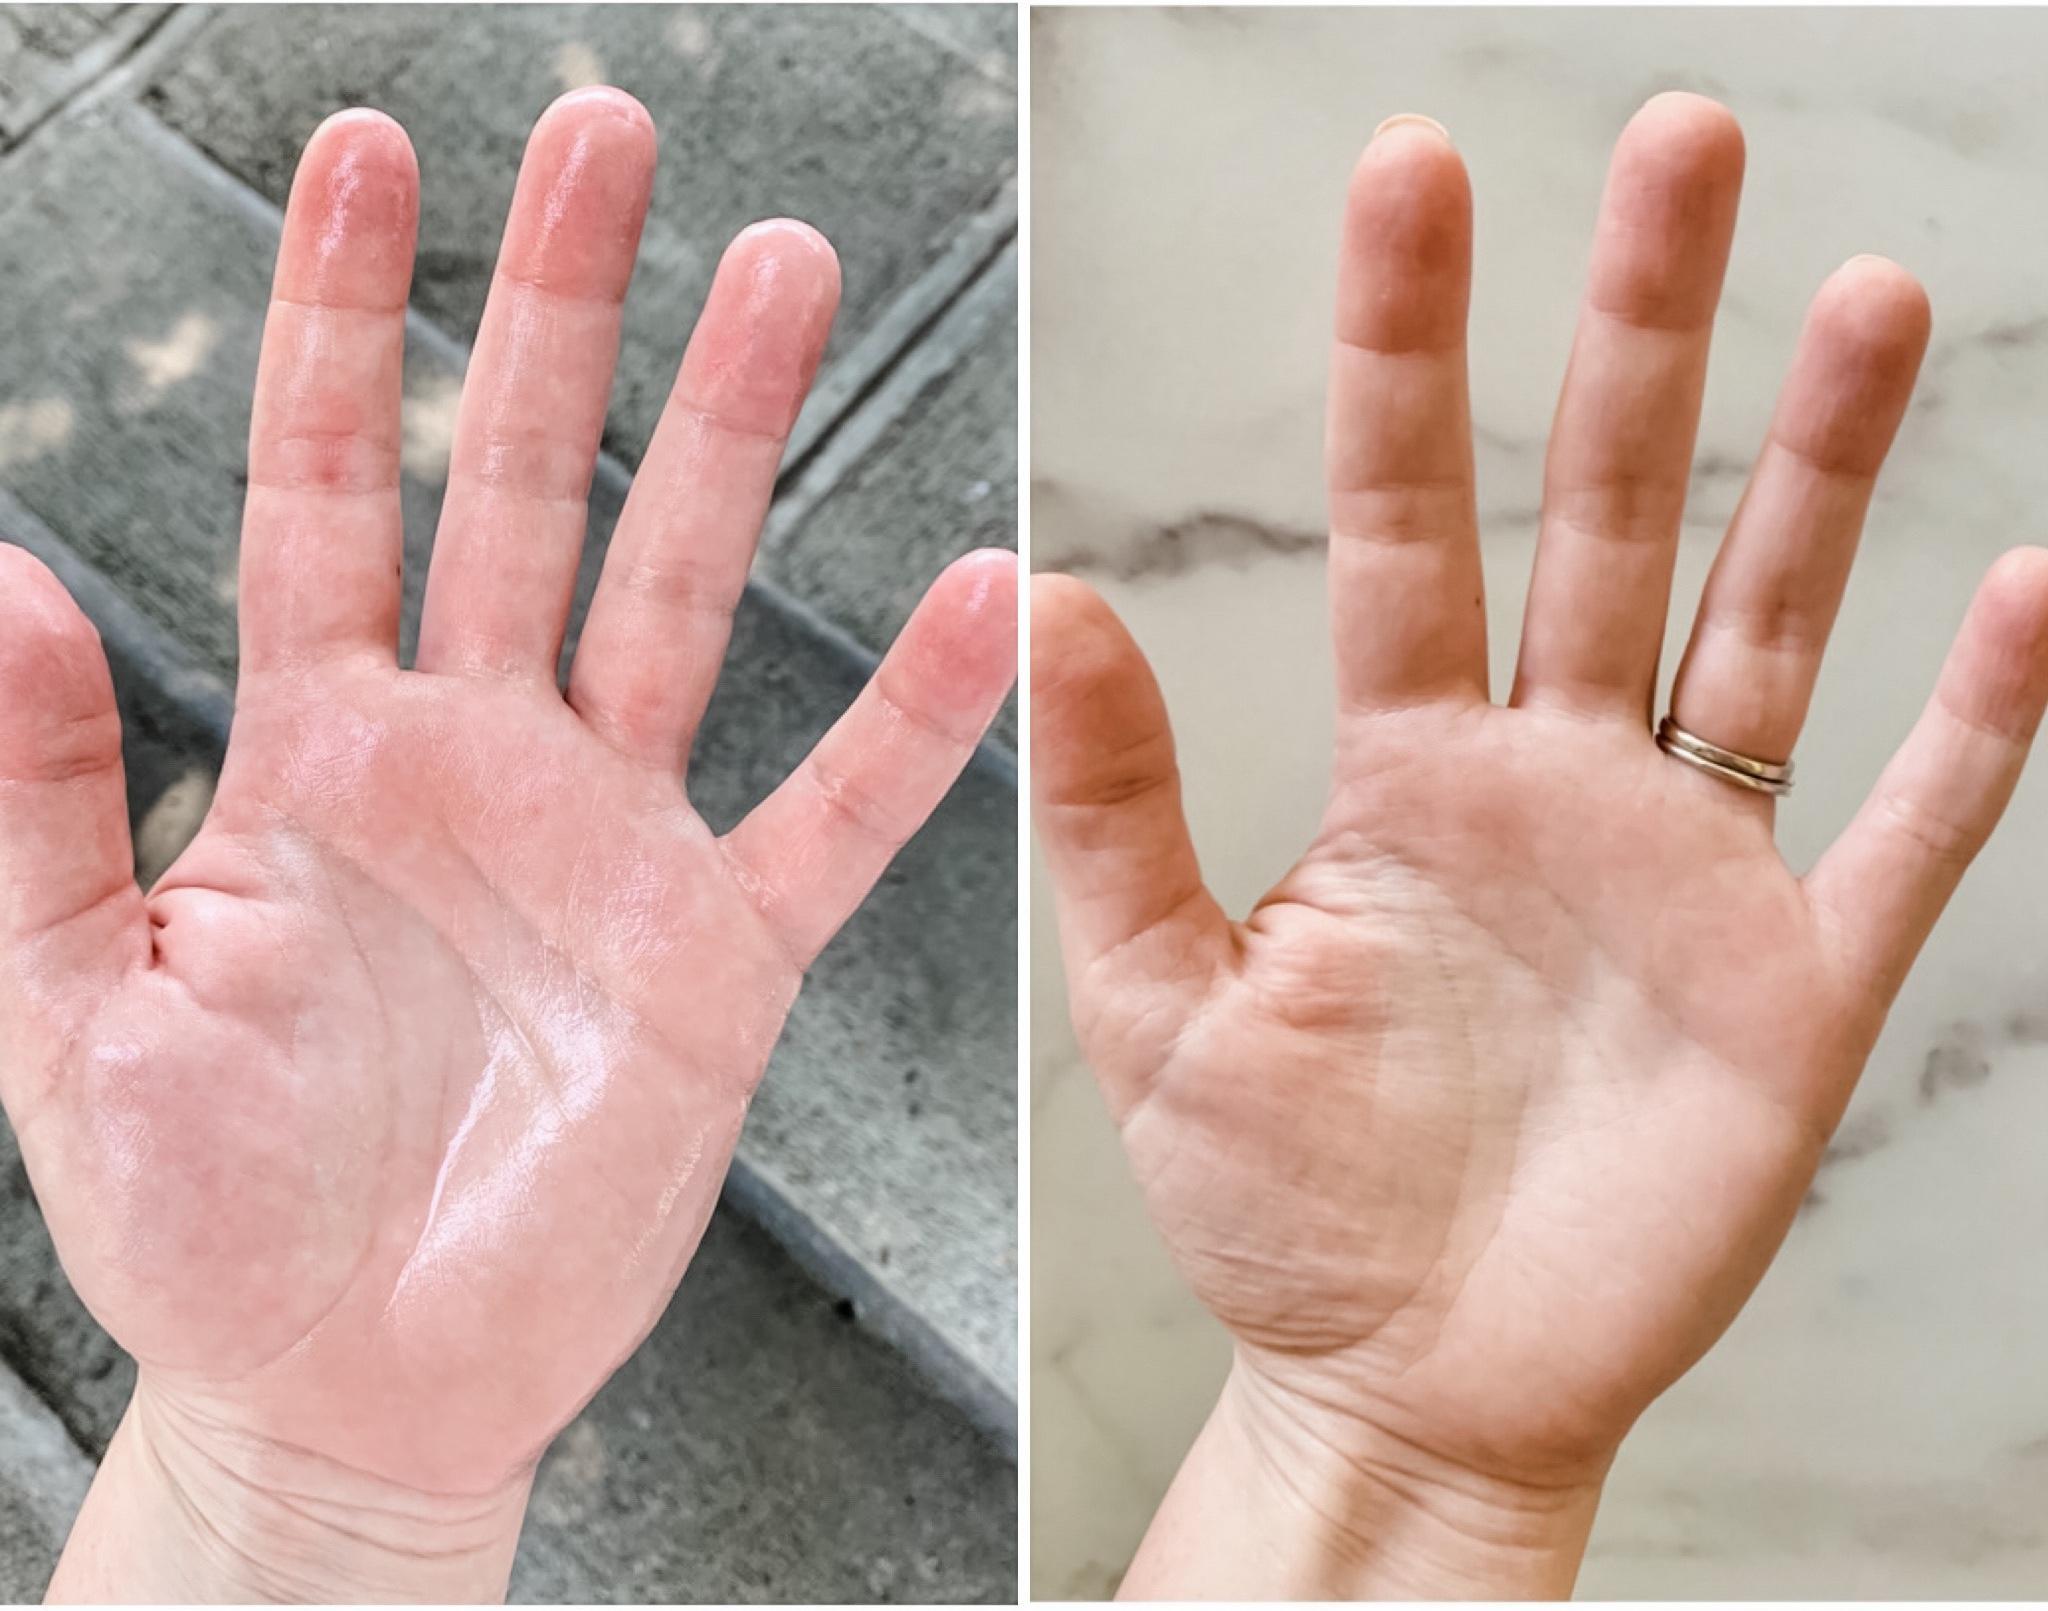 Hyperhidrosis vs normal hand